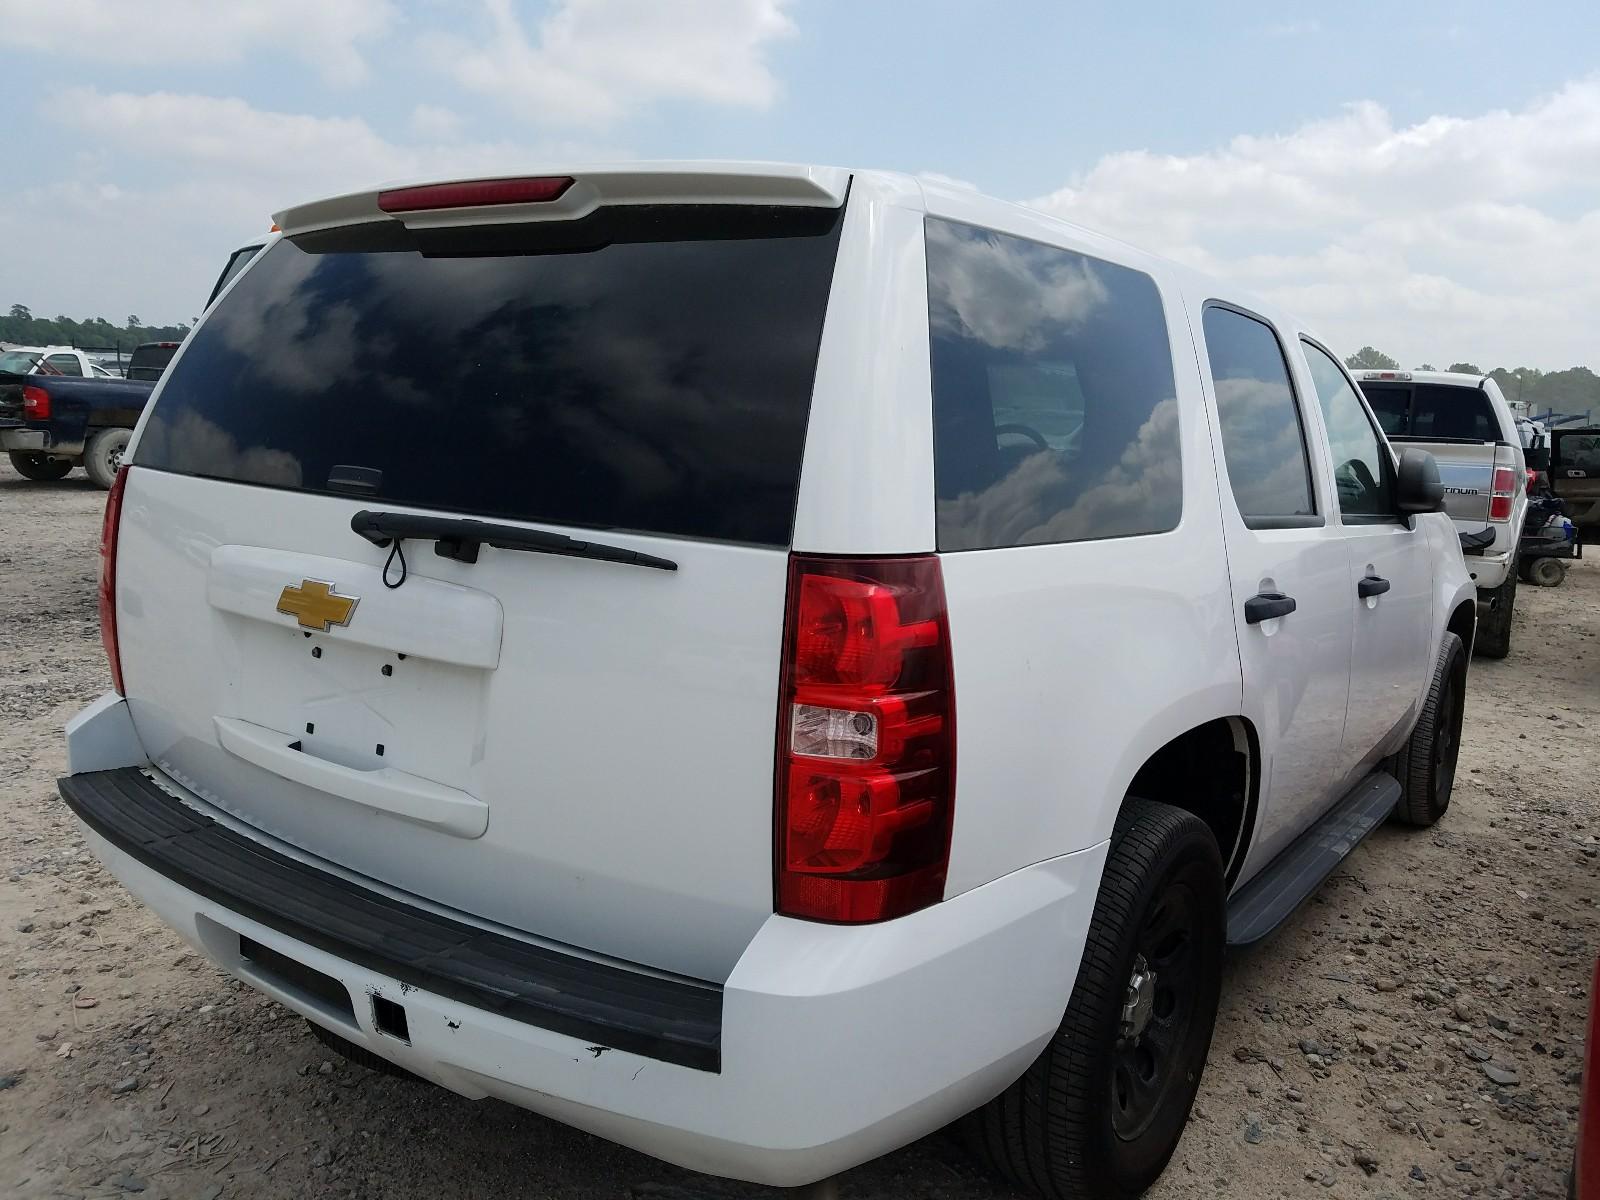 1GNLC2E09DR314859 - 2013 Chevrolet Tahoe Poli 5.3L rear view